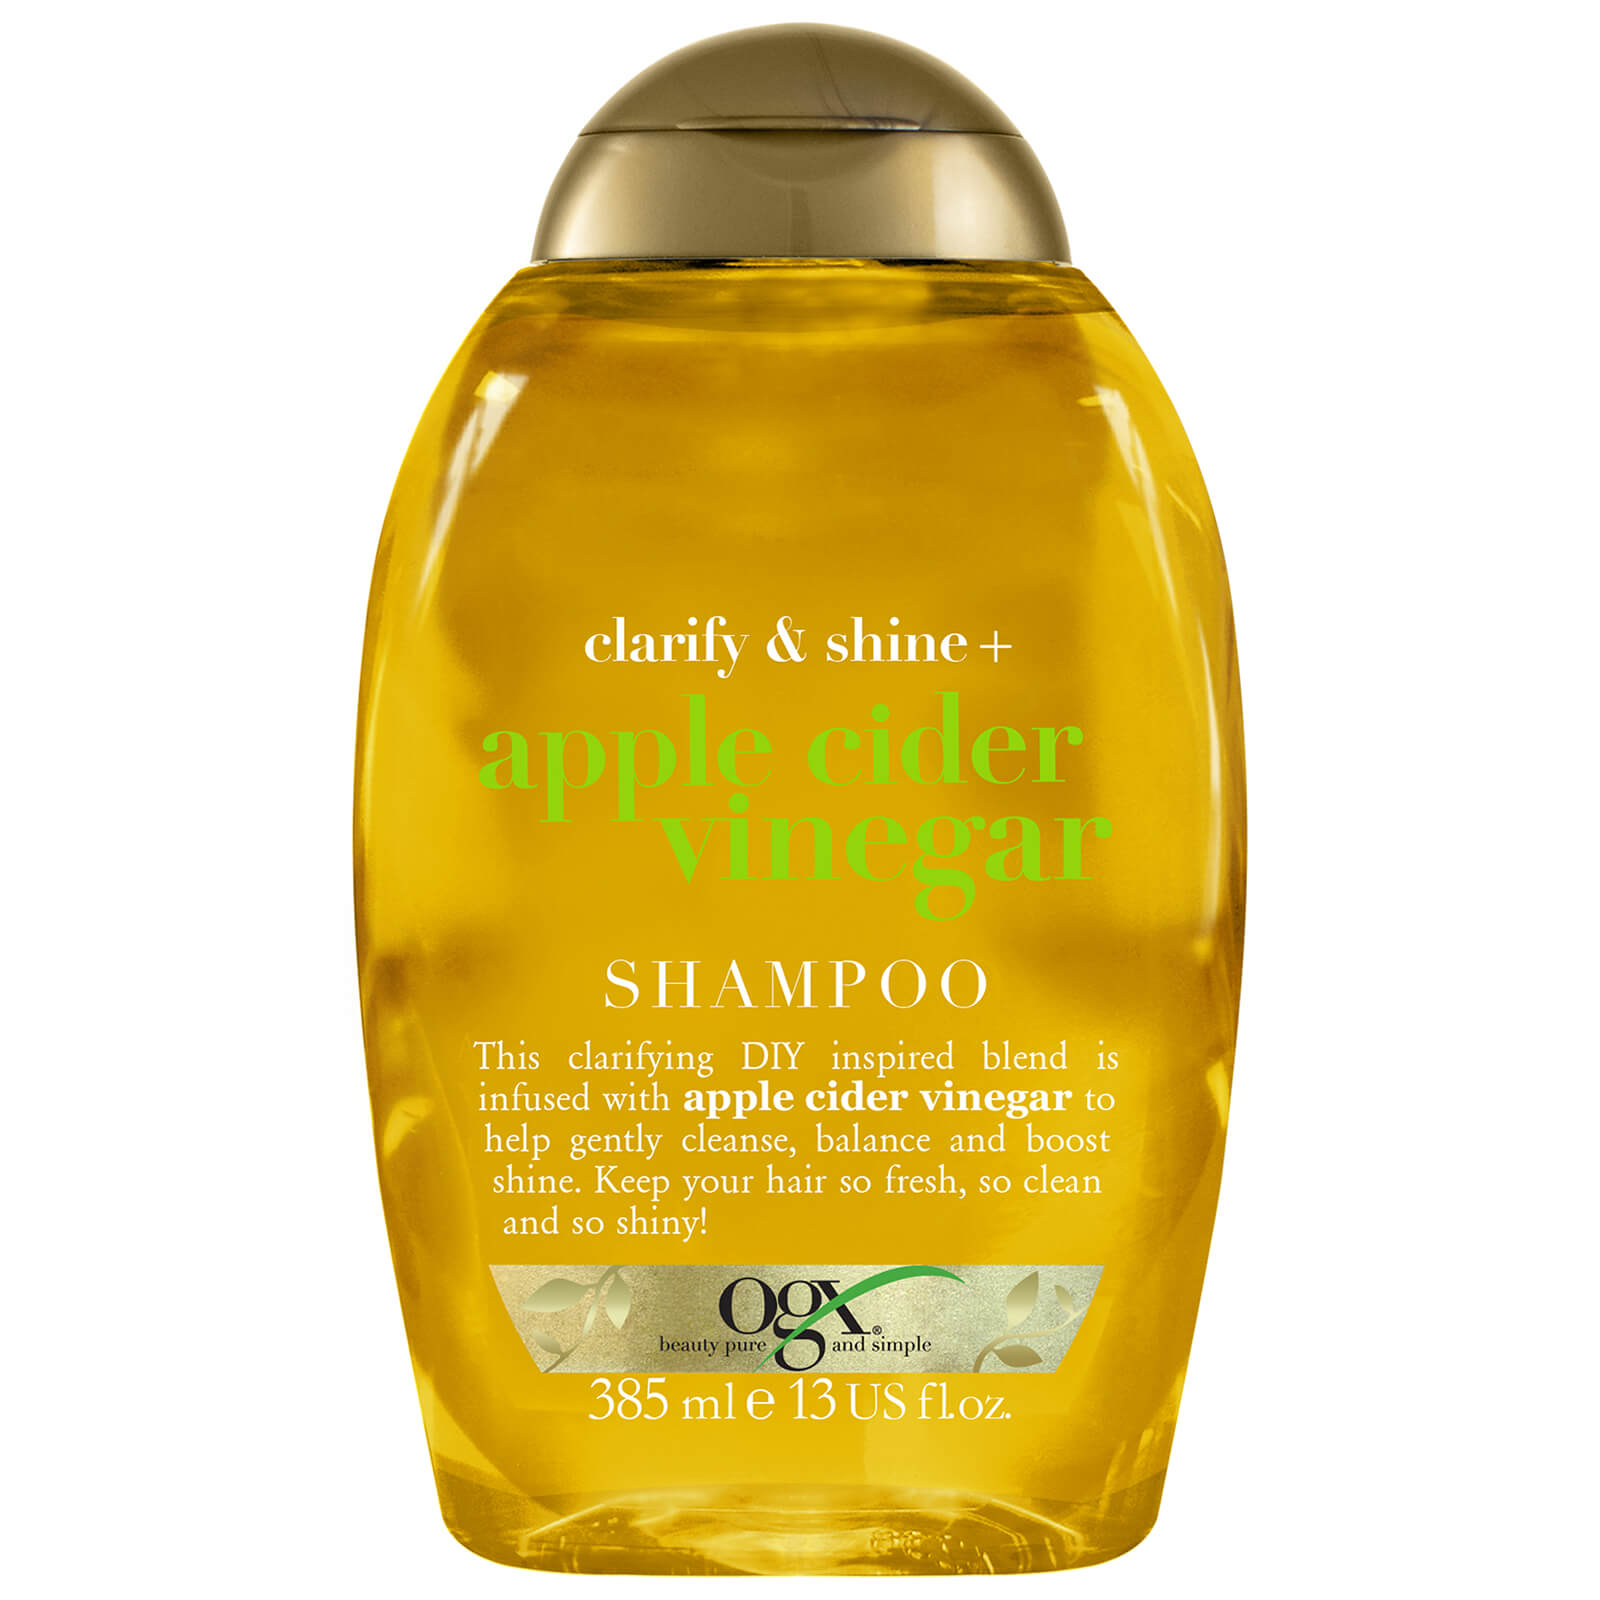 Купить OGX Clarify & Shine+ Apple Cider Vinegar Shampoo 385ml